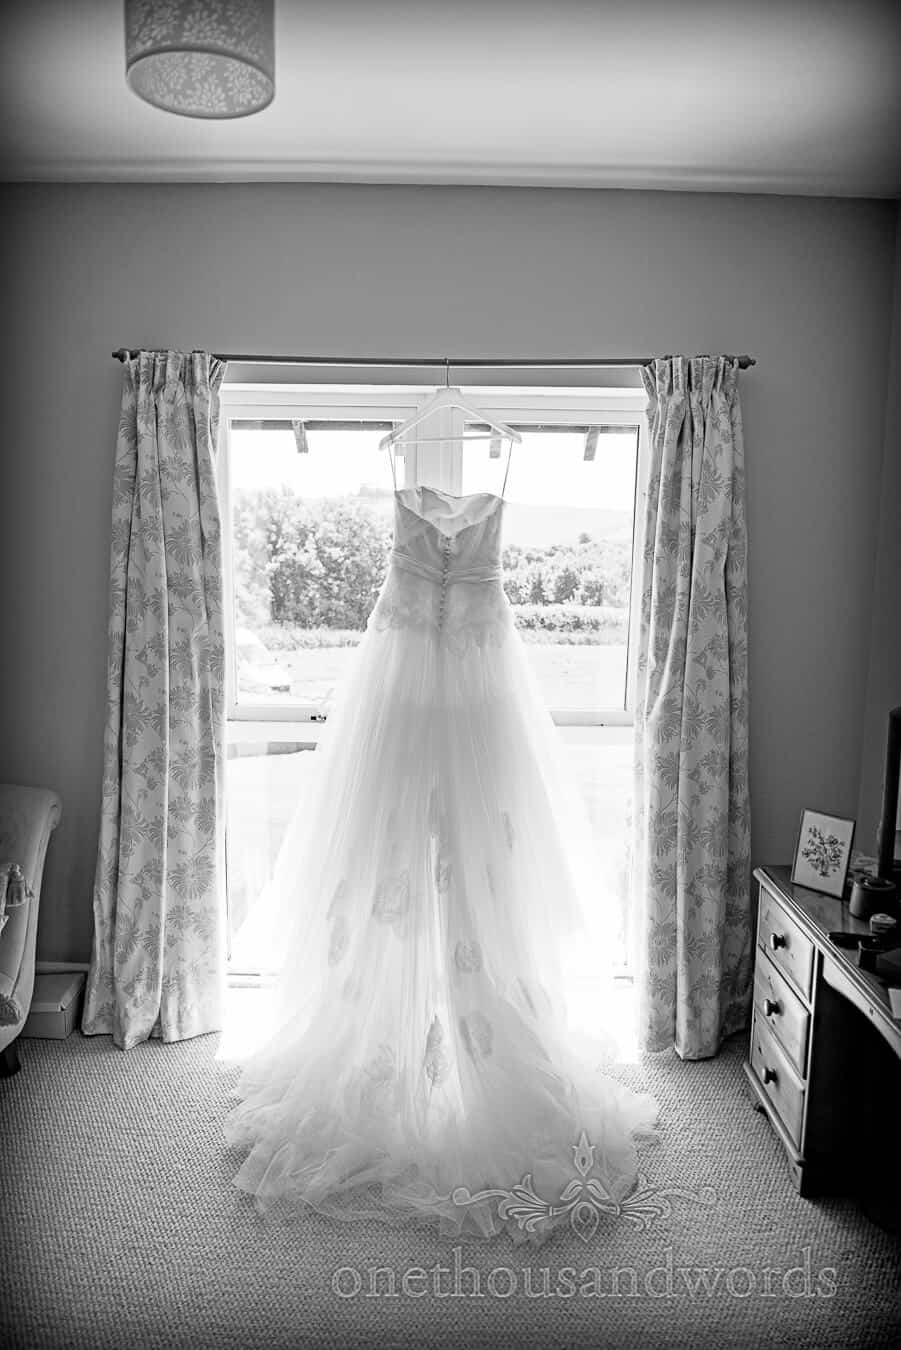 Lace wedding dress hangs in window on Dorset home wedding morning